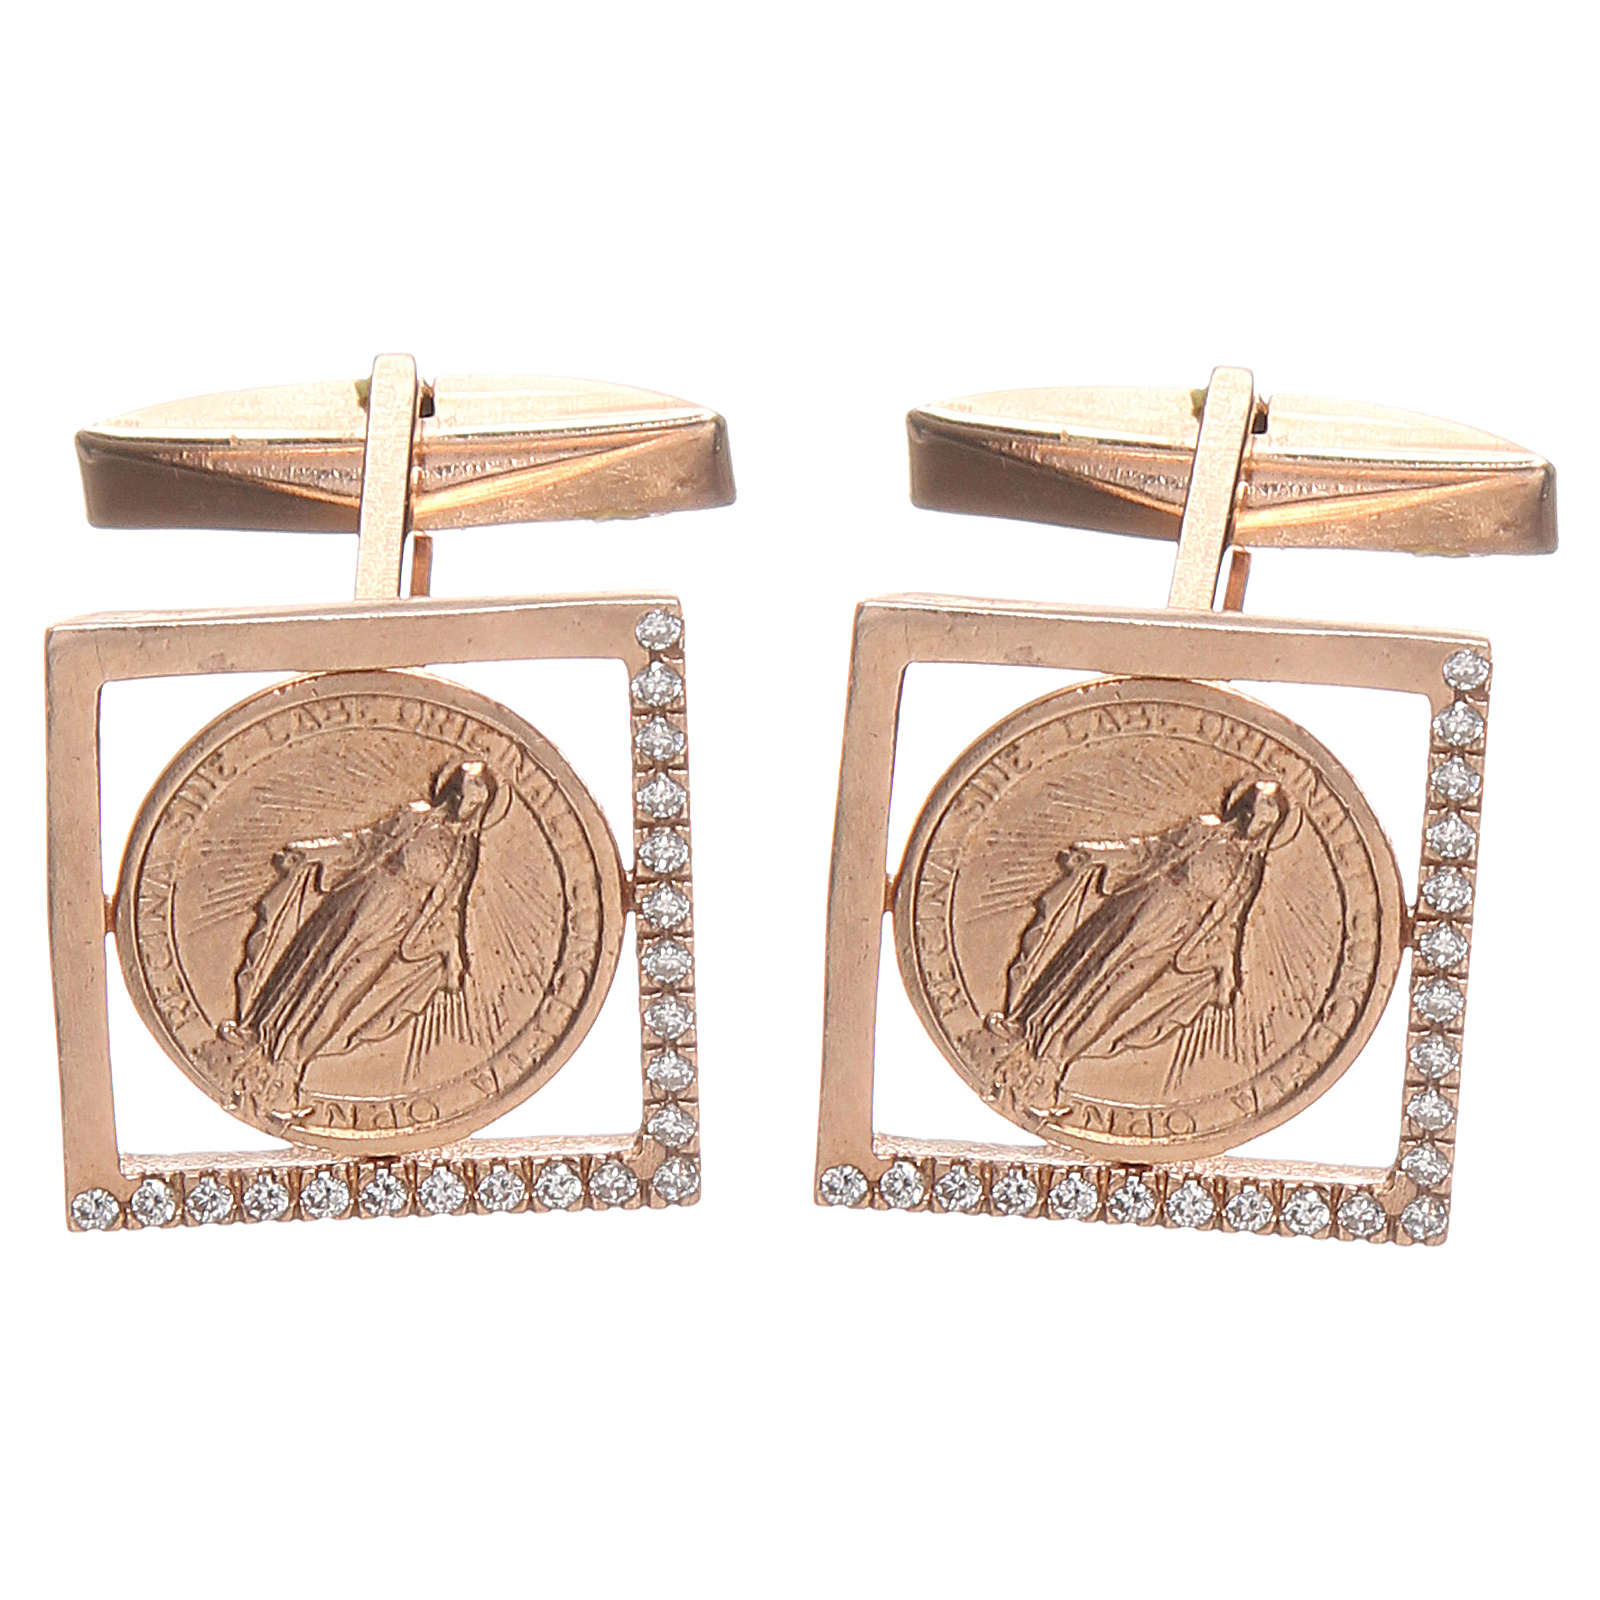 Mancuernillas joyas plata 800 Virgen Milagrosa 1,7x1,7 cm 4